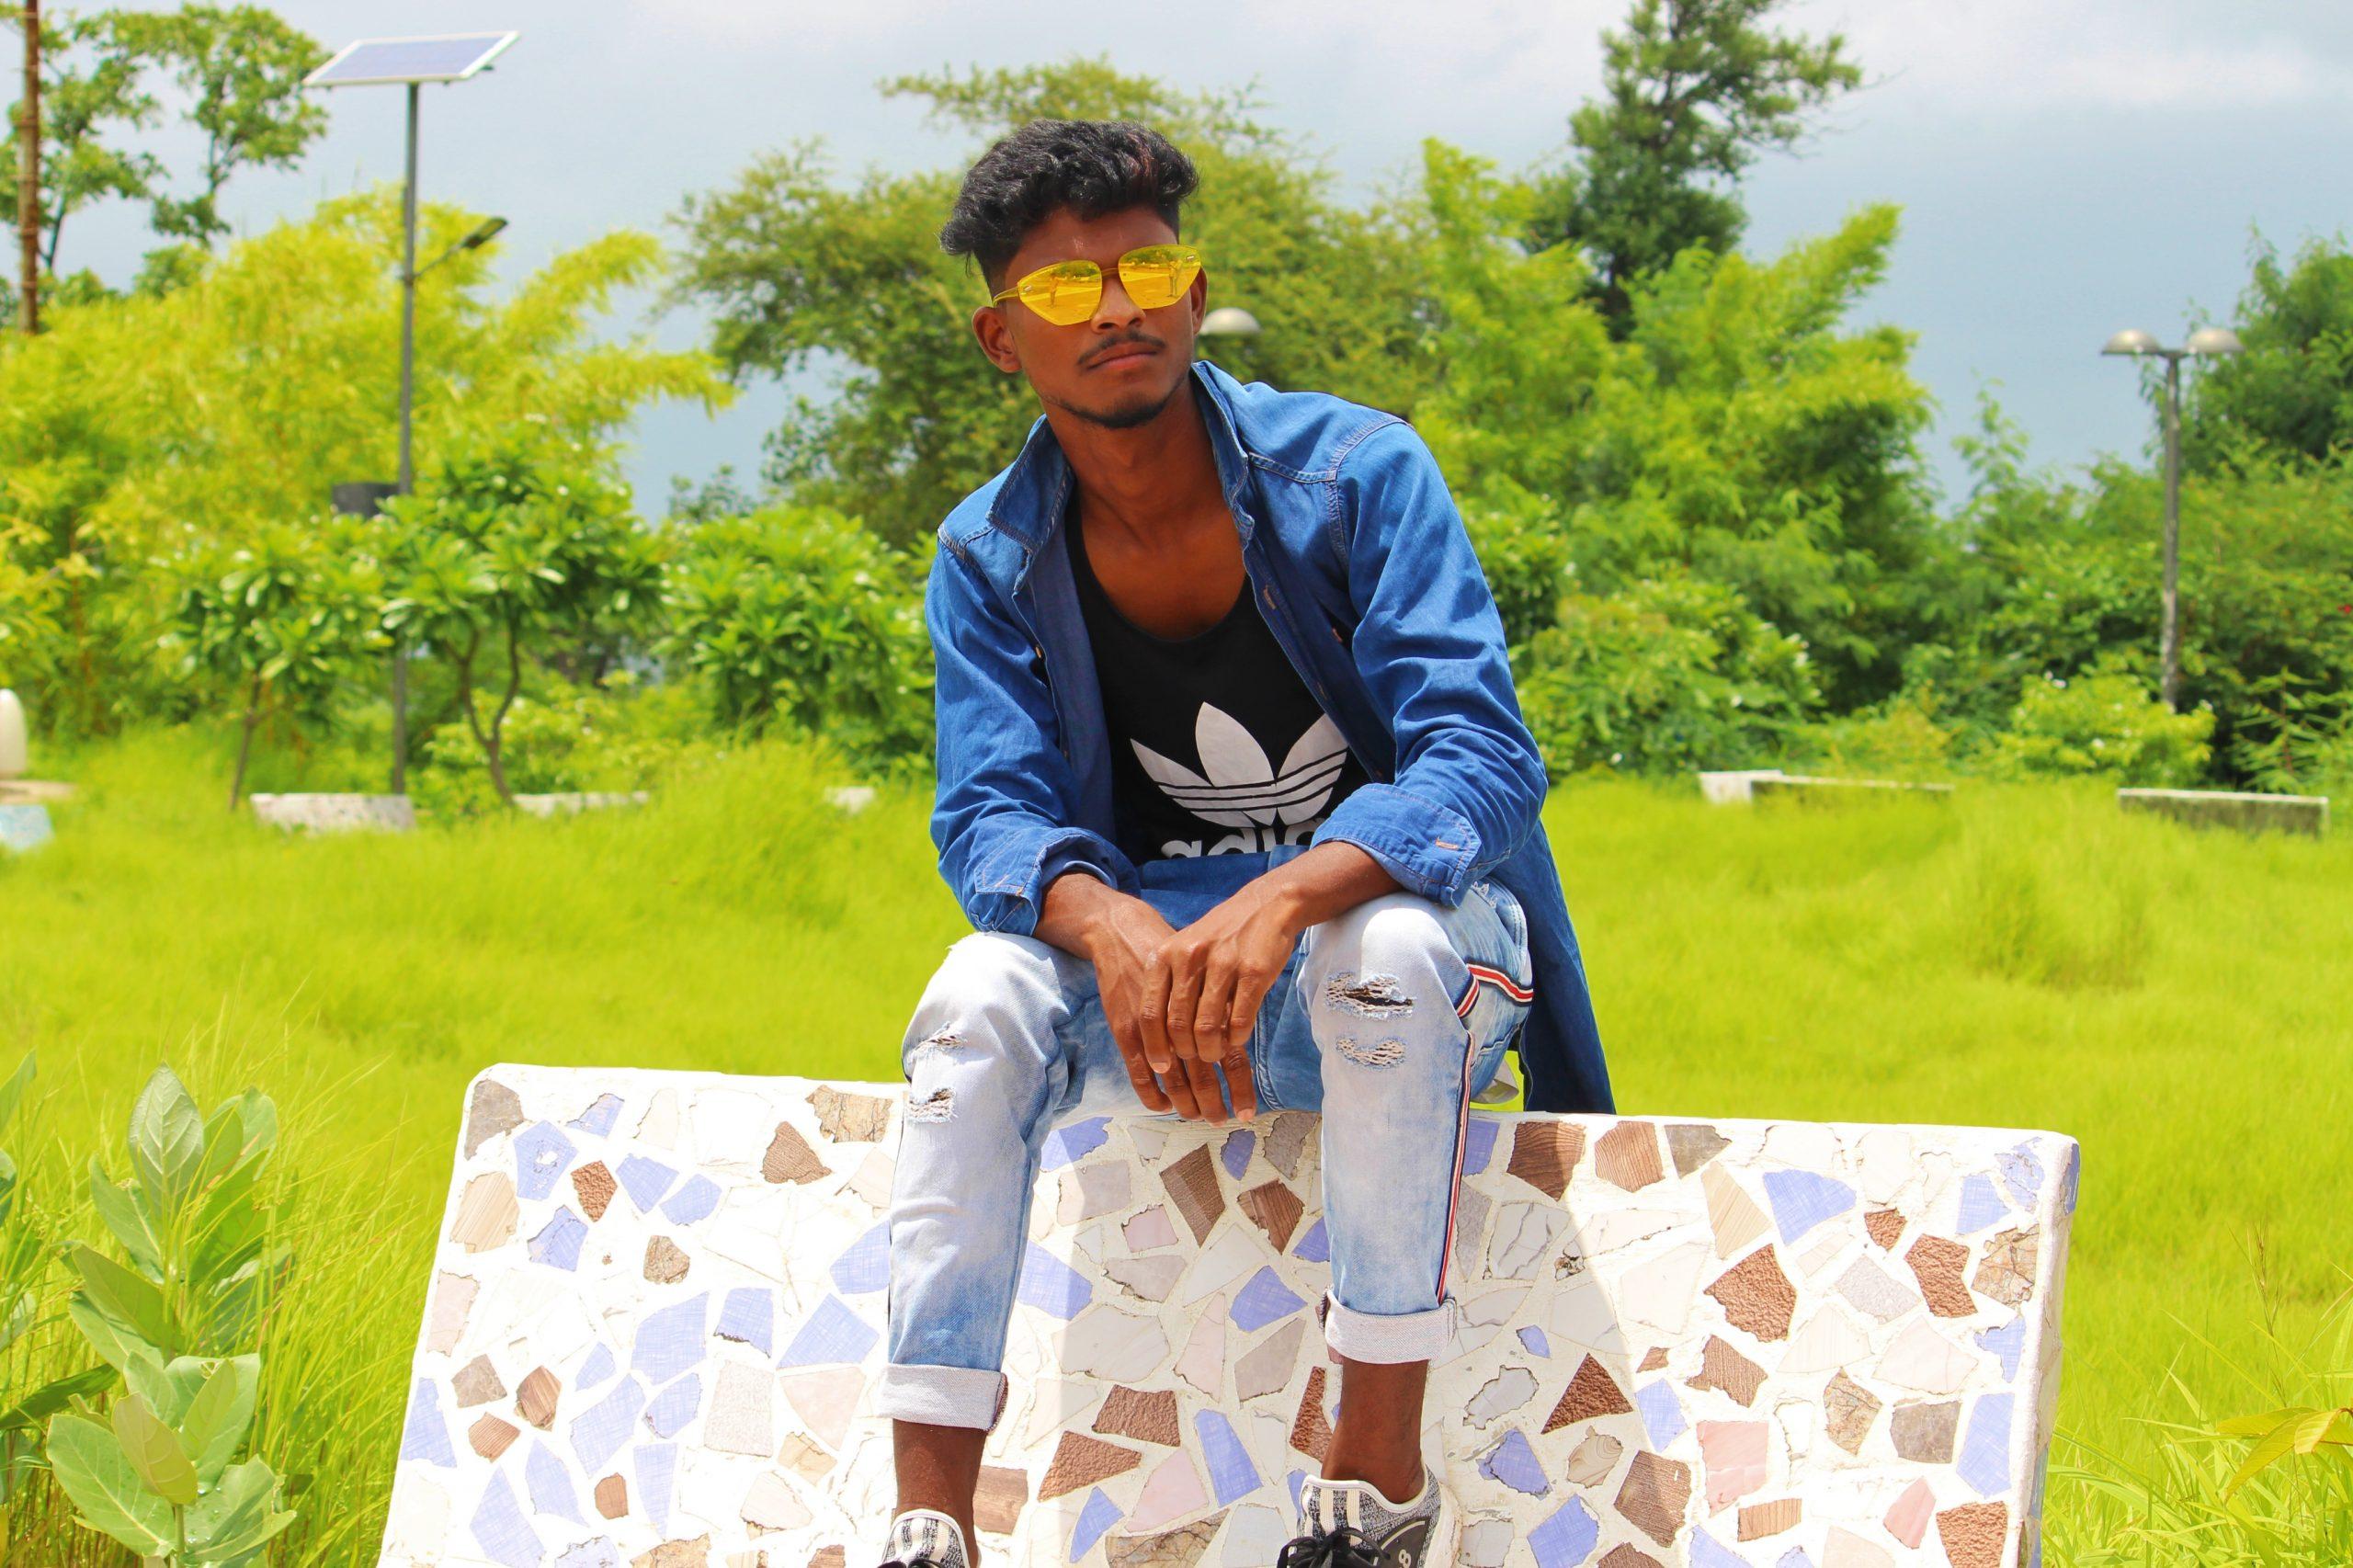 Model posing in garden with sunglasses